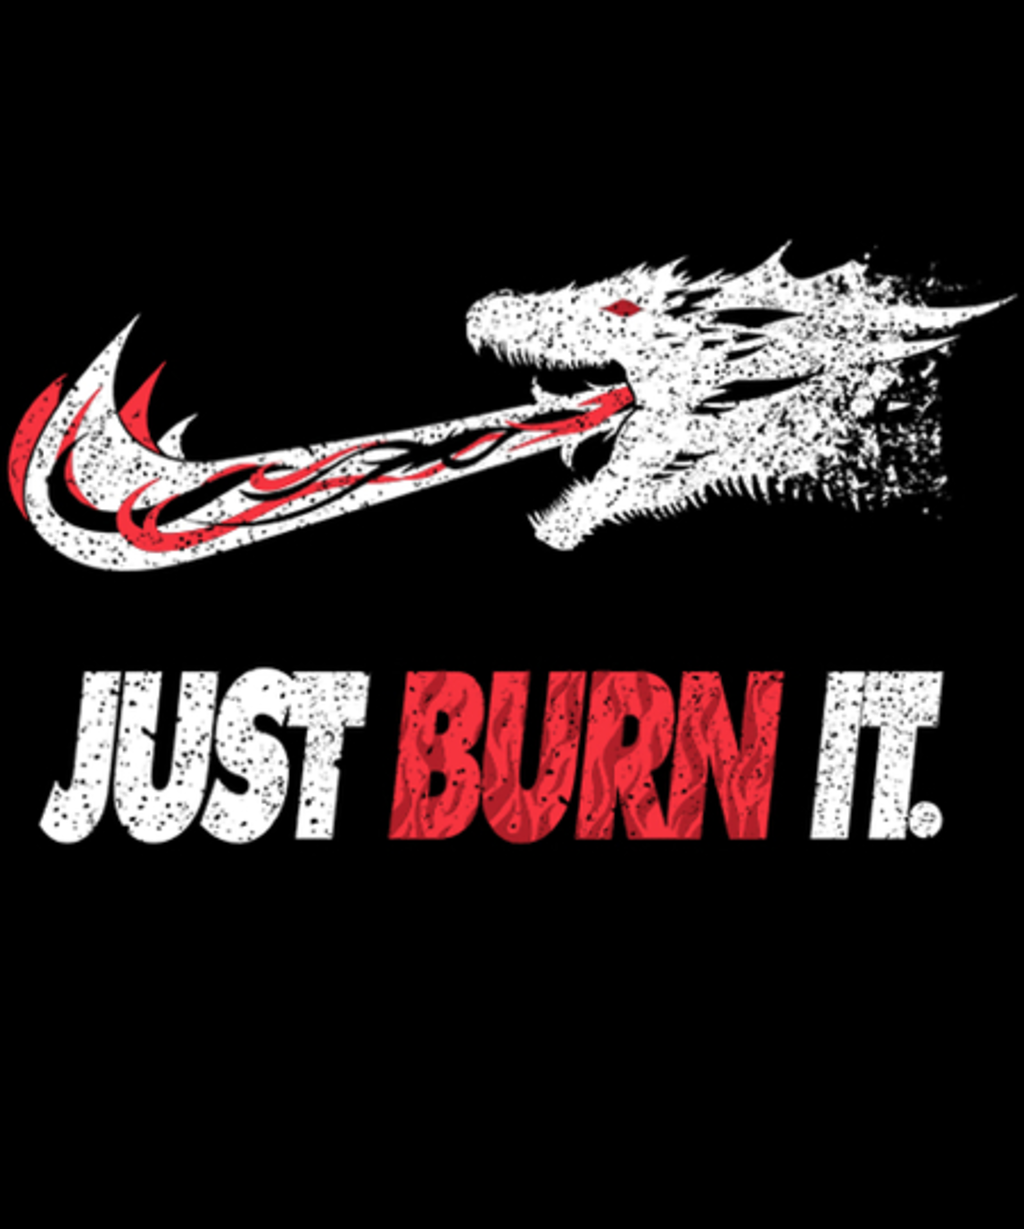 Qwertee: Just Burn It!